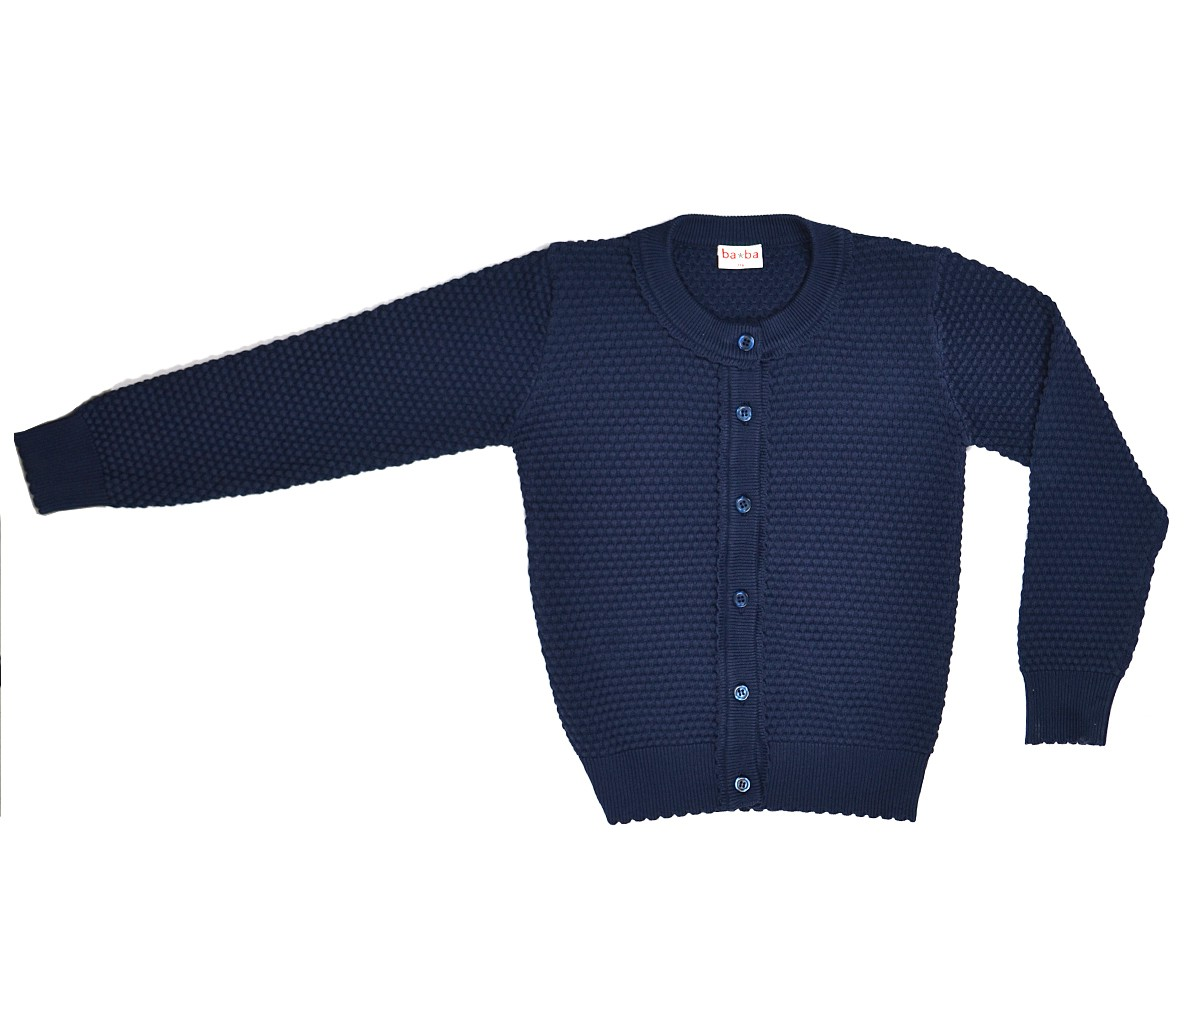 Cardigan knit blauw